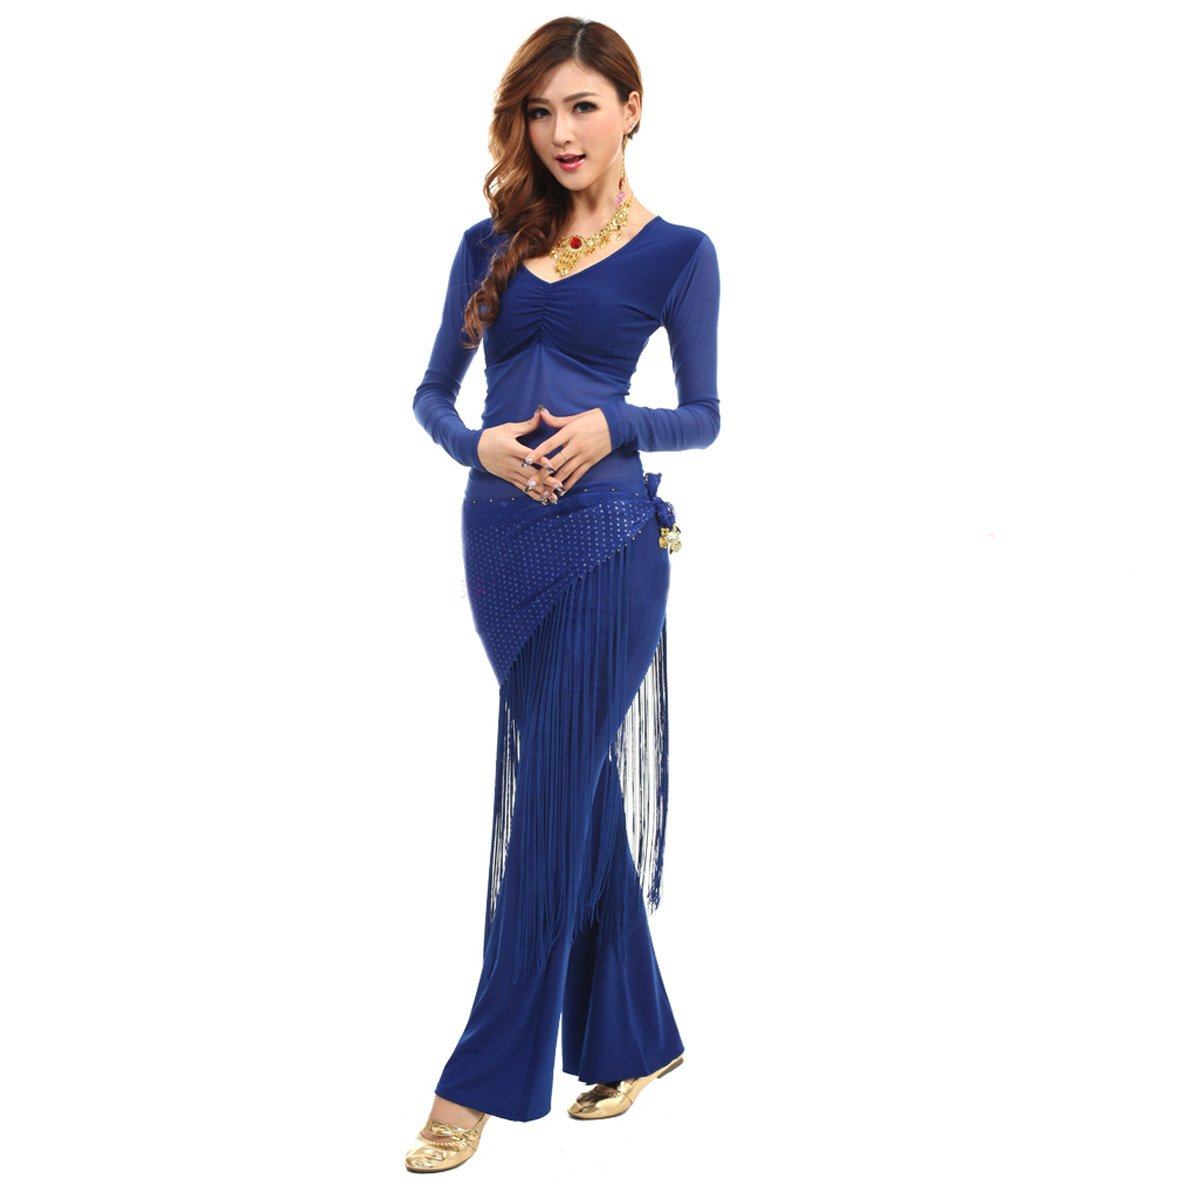 VENI MASEE Langarmshirt Belly Dancing Top und Hose, mit Quaste Bling Hip Schals, Preis/Set Preis / Set - blau R-G-2HSF-1097_Blue